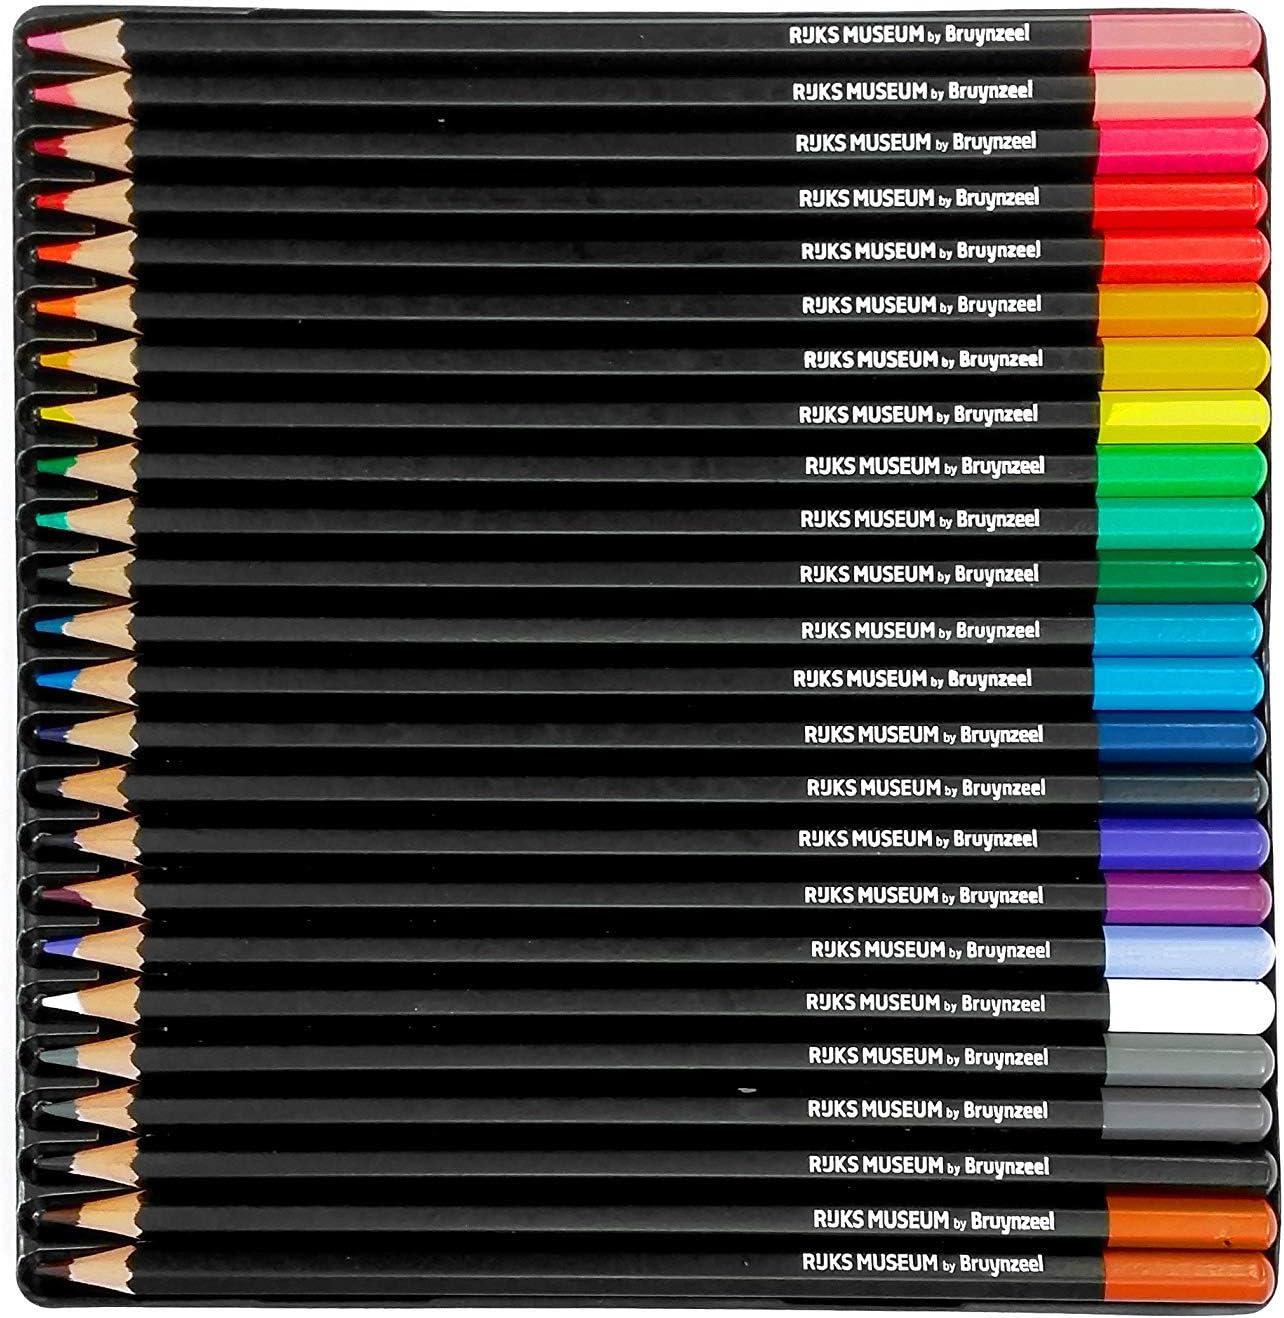 /Rijks Museum Edition di 24/matite colorate di alta qualit/à/ /la Lattaia Bruynzeel/